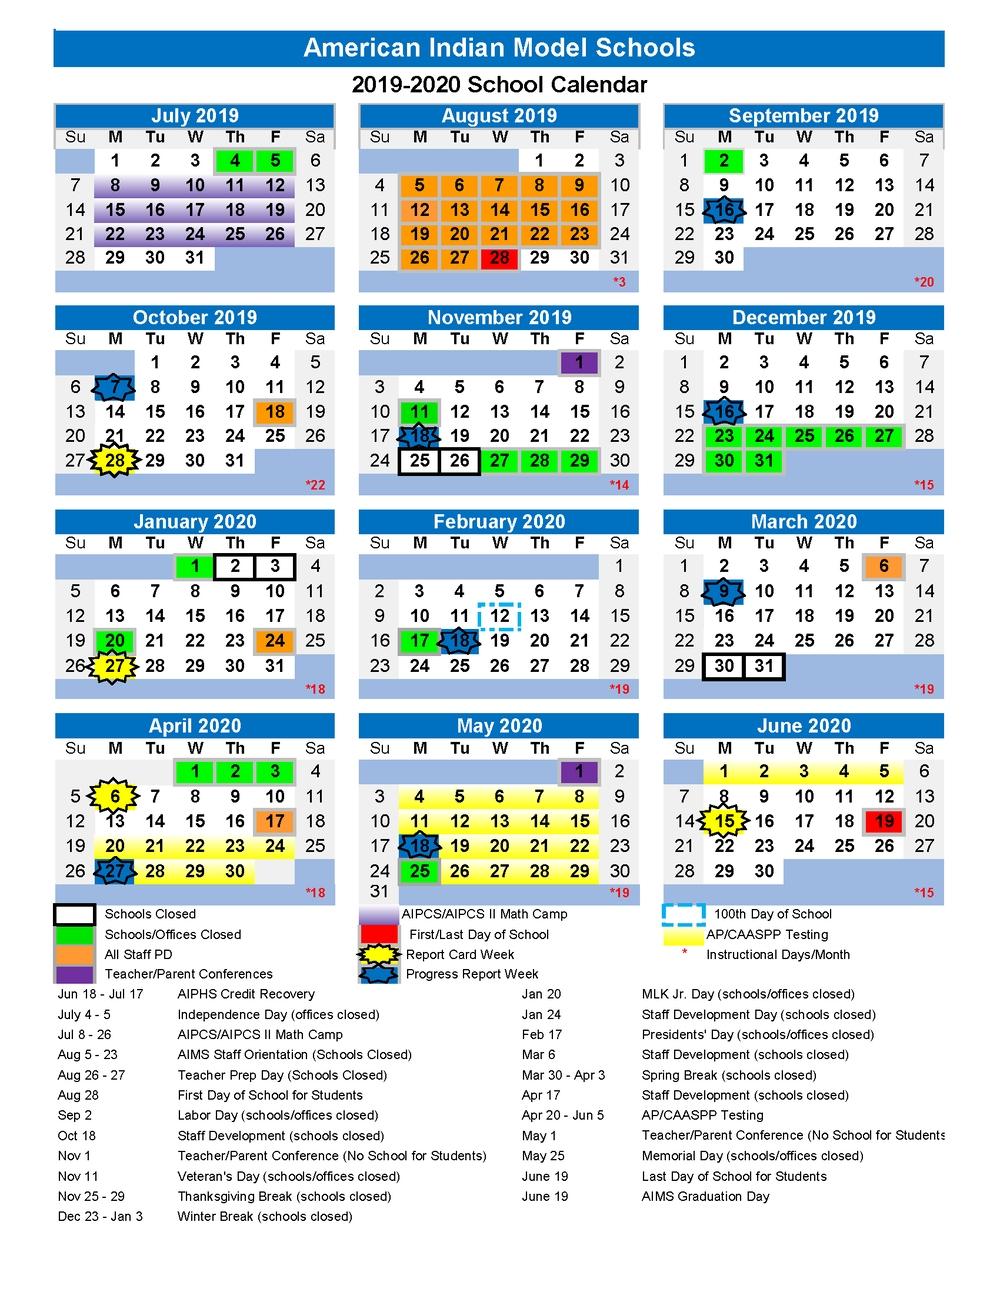 Thanksgiving Break (School Closed) — Aims K-12 with regard to Uc Berkeley School Calendar 2019 2020